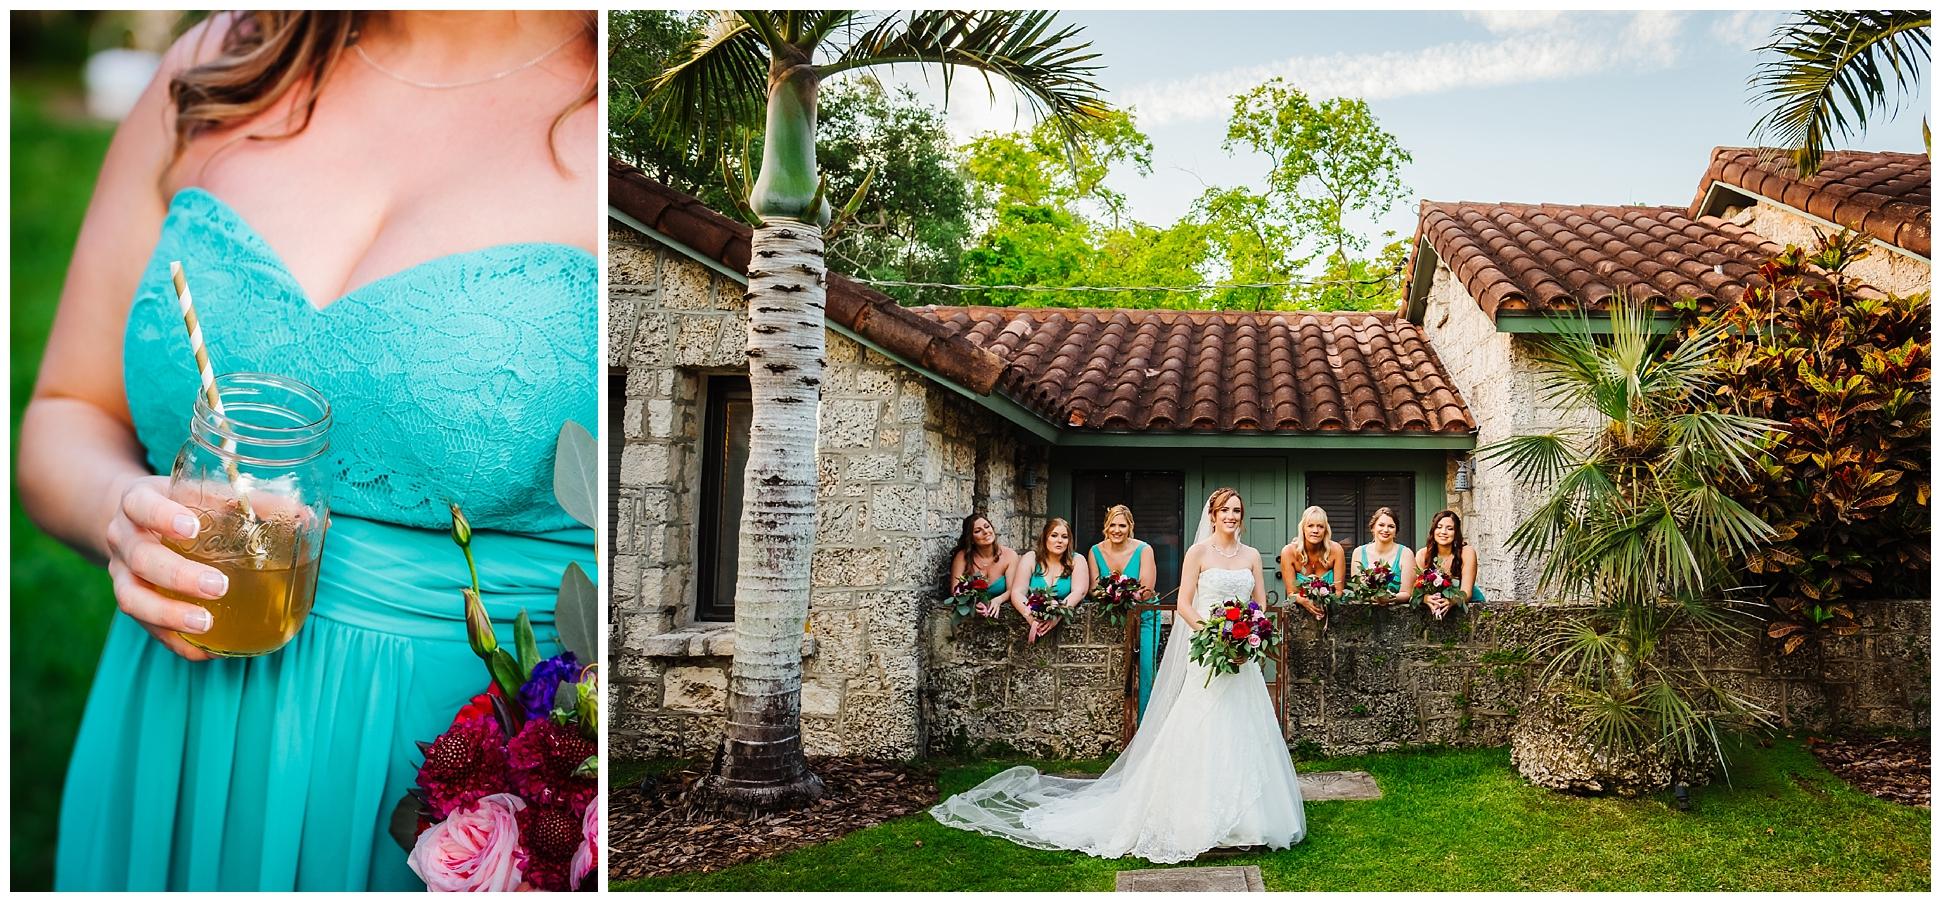 florida-destination-wedding-photographer-enchanted-tropical-miami-homestead-cooper-estate-teal_0060.jpg